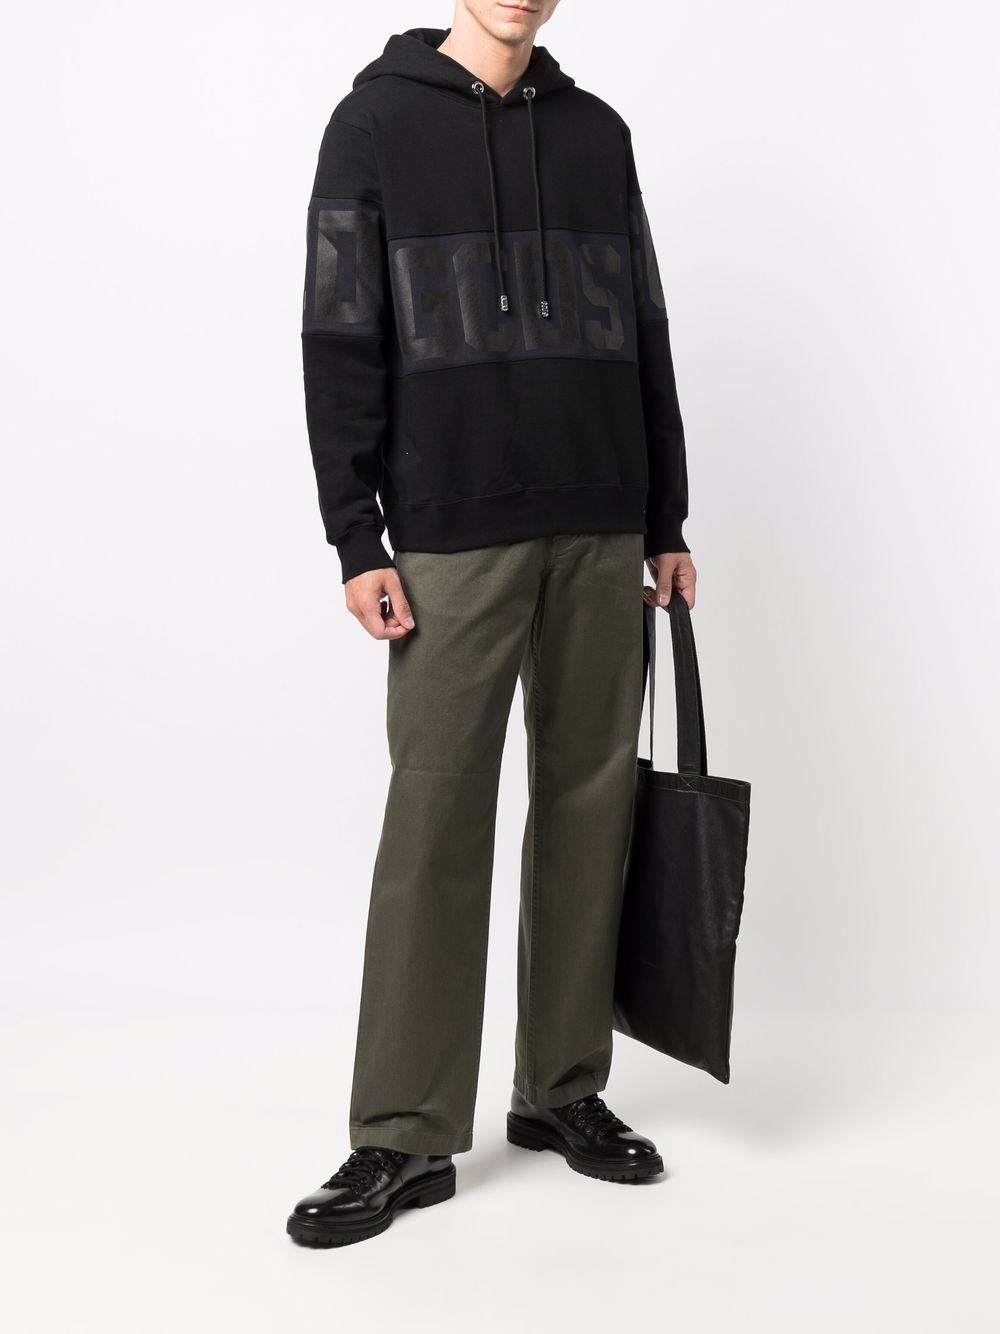 felpa con logo uomo nera in cotone GCDS | Felpe | CC94M02150302